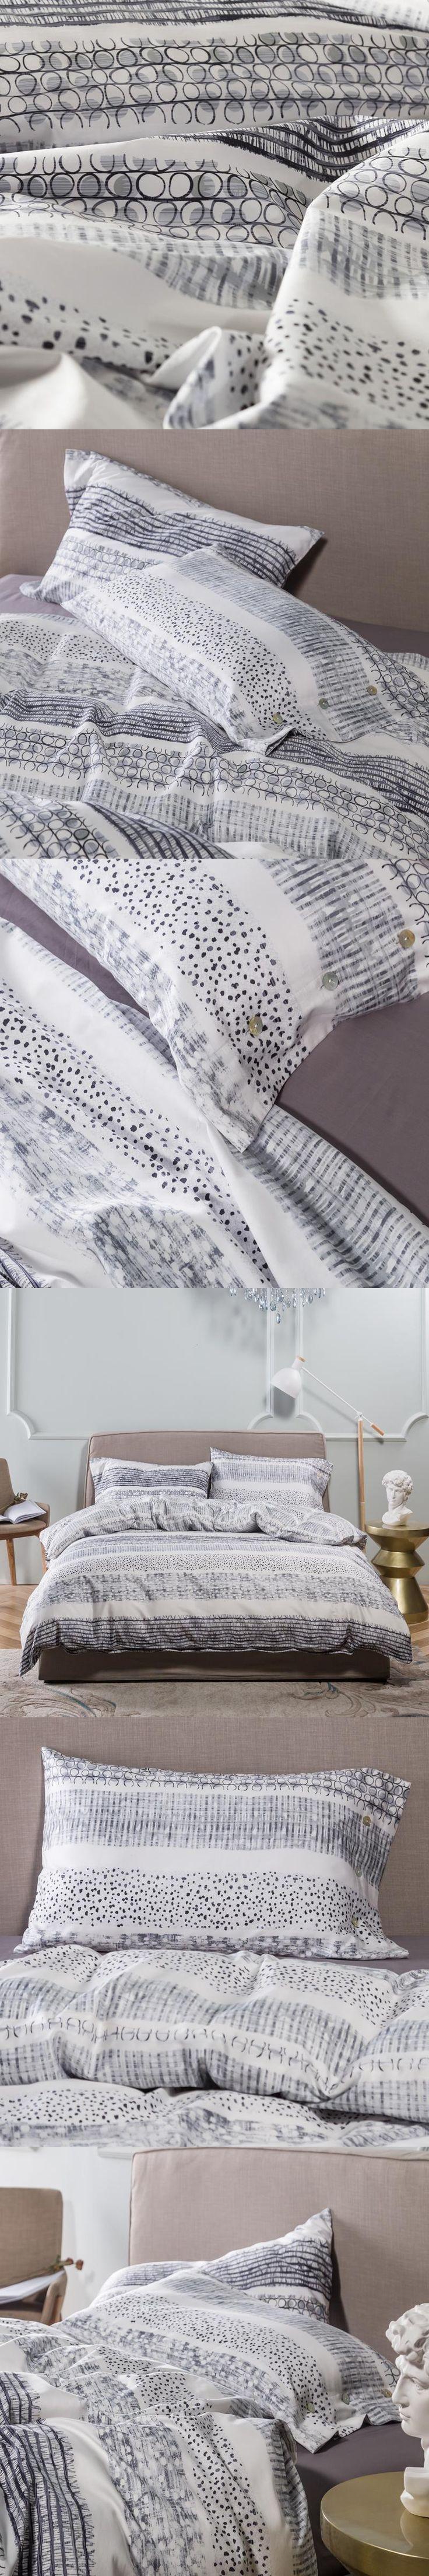 fashion geometric print bedding sets queen king double twin size egyptian cotton bedlinens duvet cover sheet